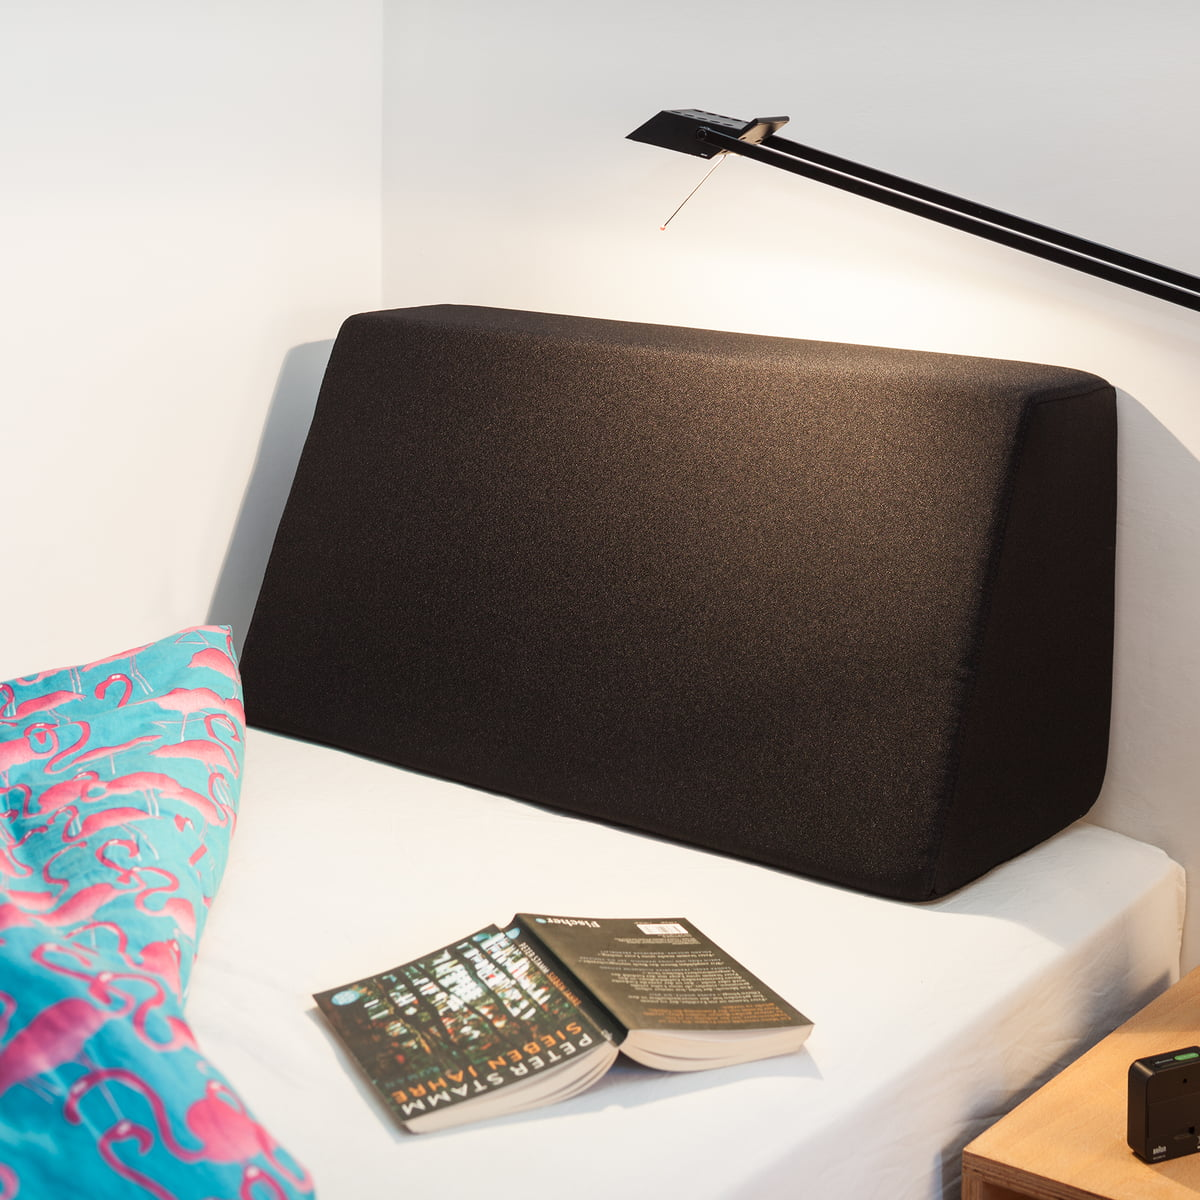 lehn r ckenkissen f r tojo bett von tojo connox. Black Bedroom Furniture Sets. Home Design Ideas